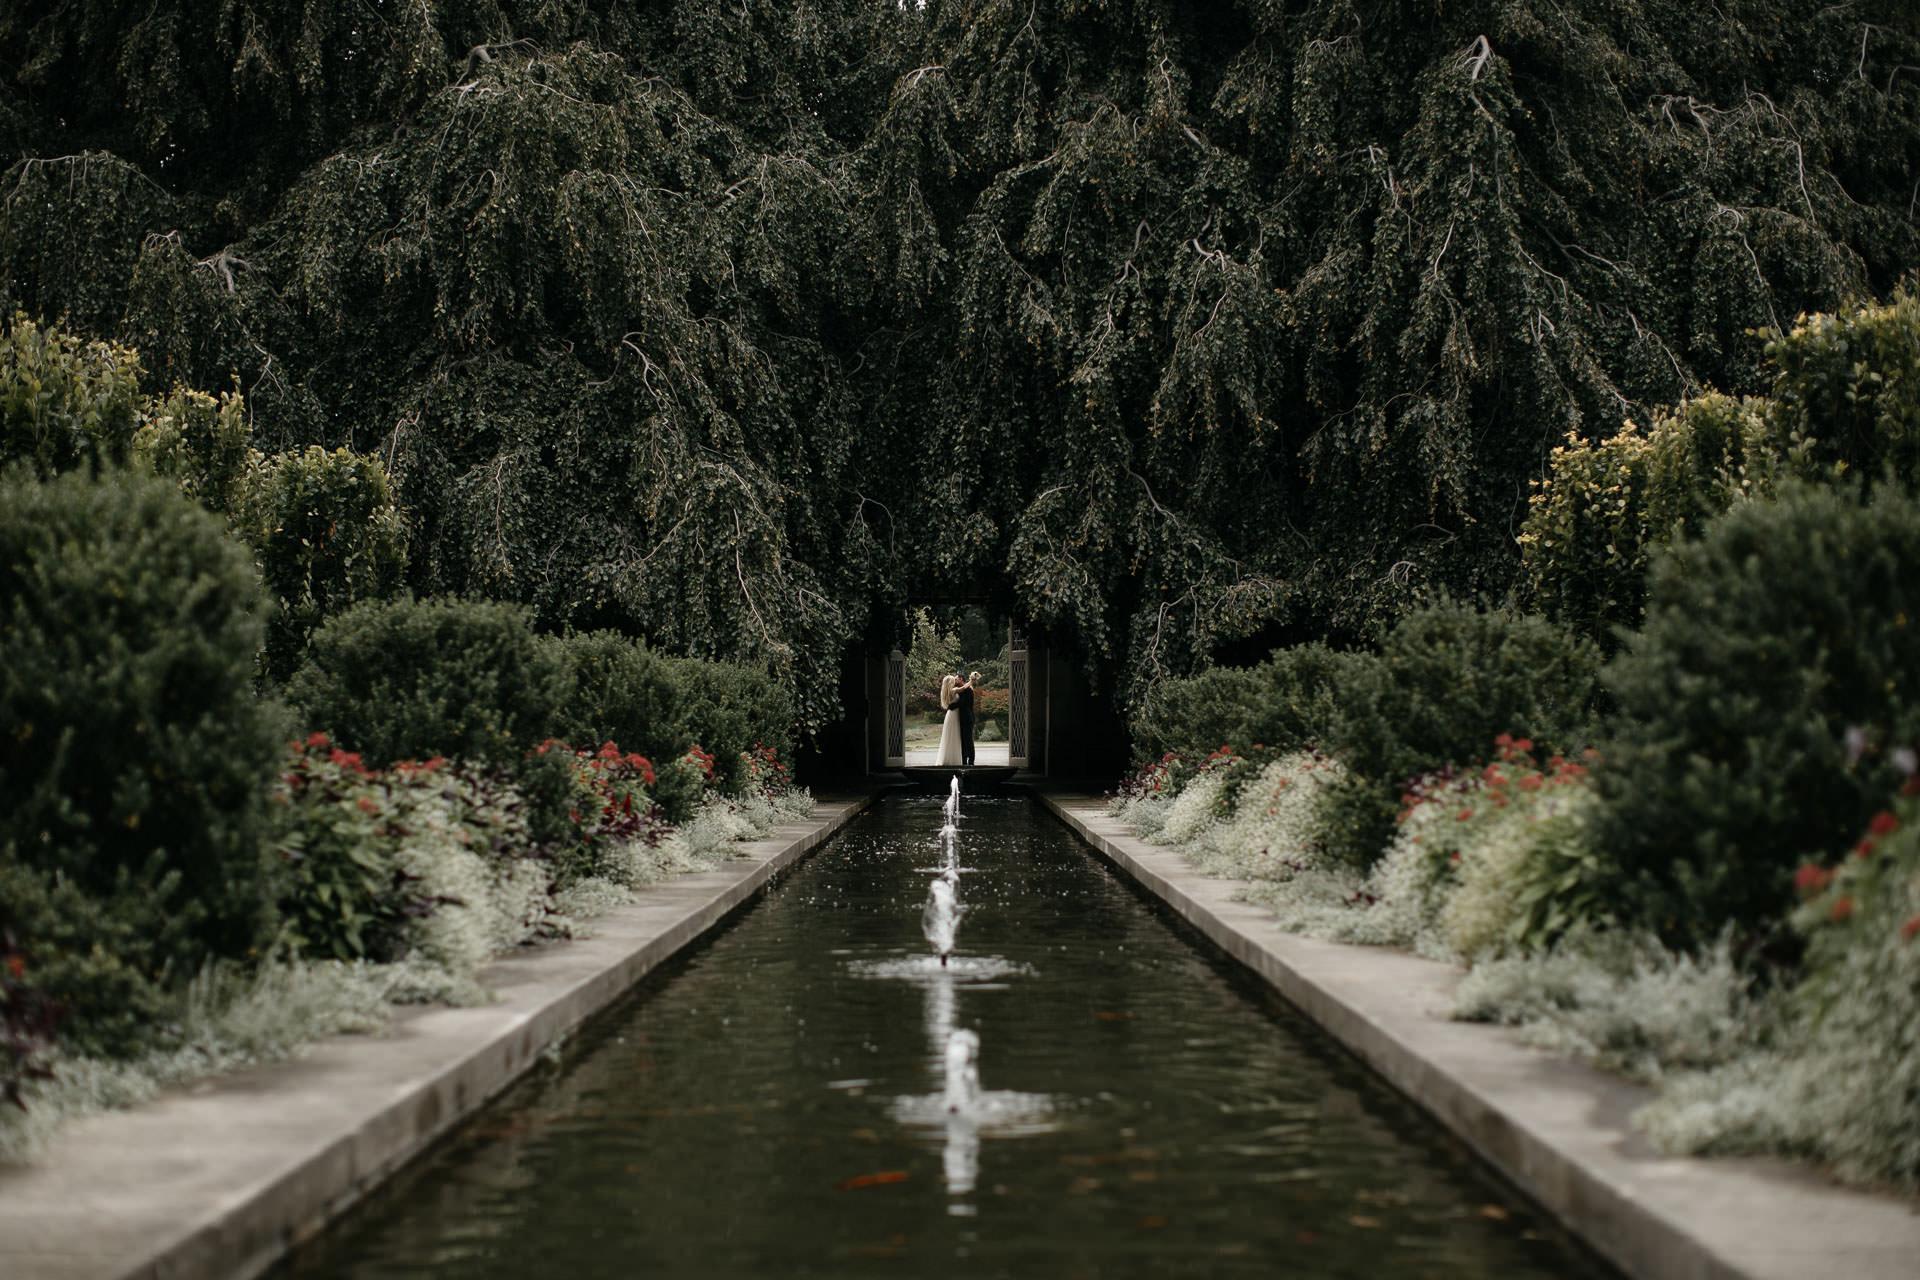 Elopement Untermyer Gardens in New York City by Jean-Laurent Gaudy